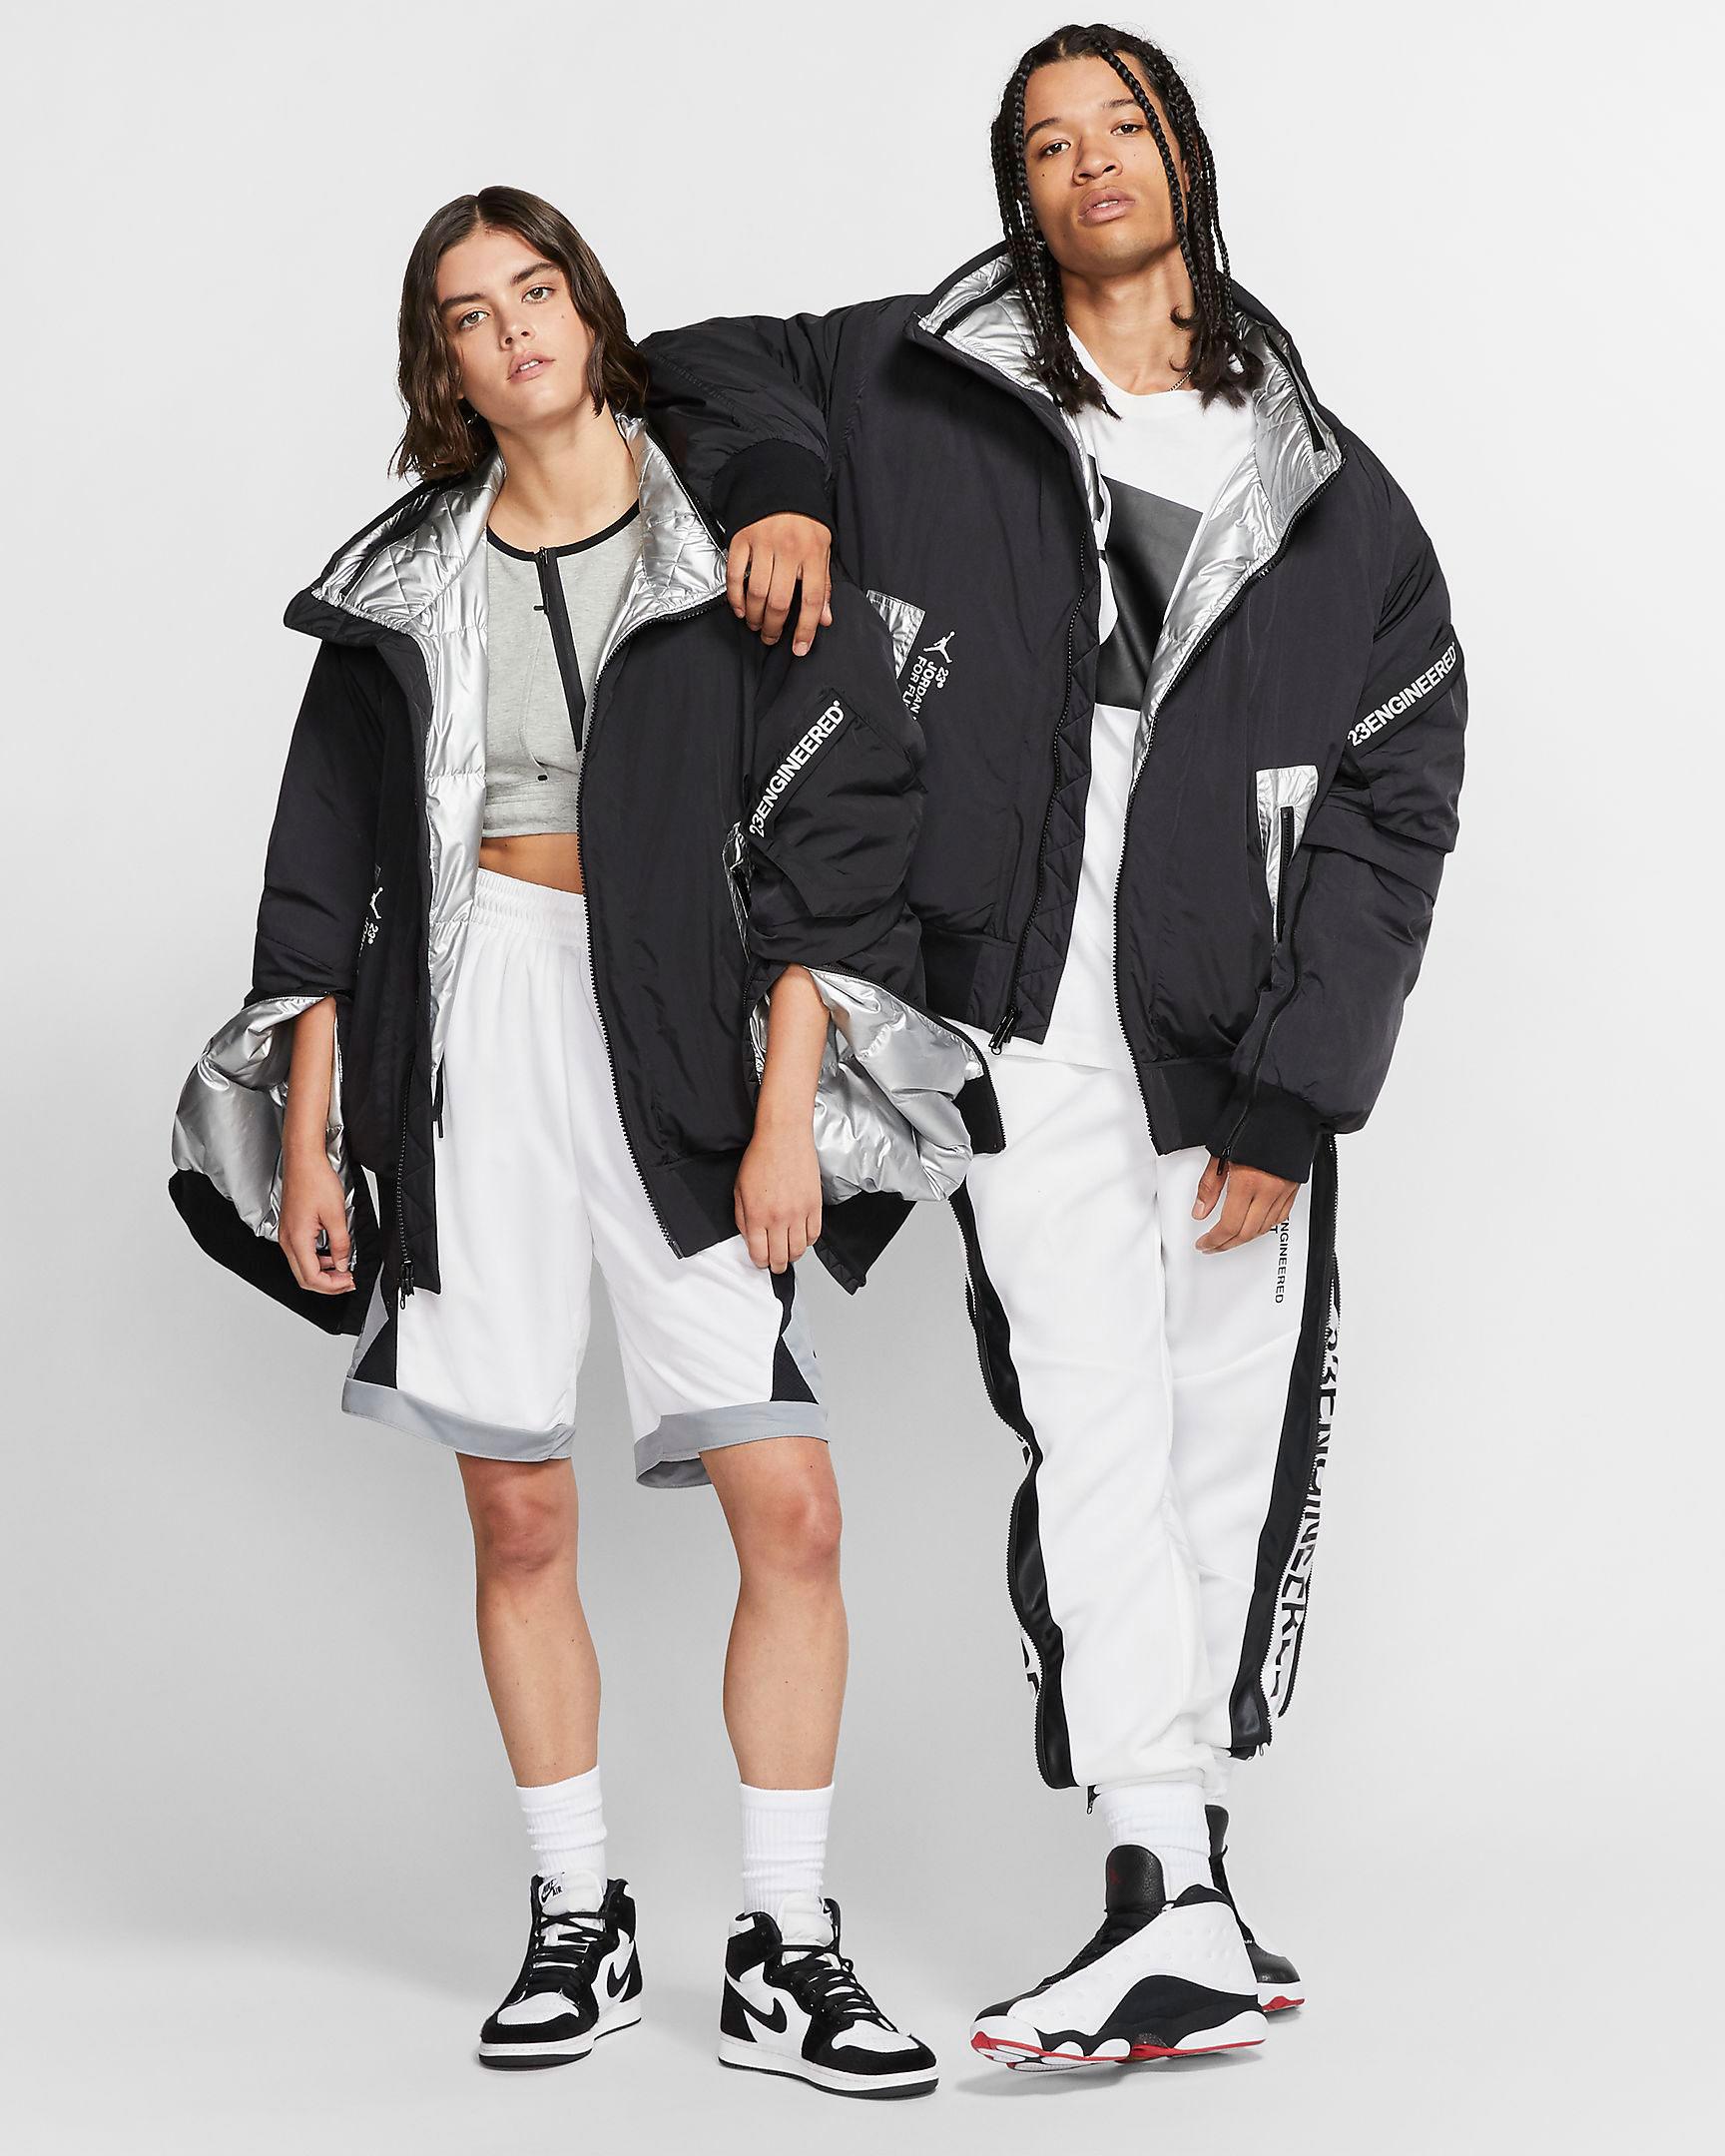 jordan-23-engineered-ma1-down-jacket-black-silver-10